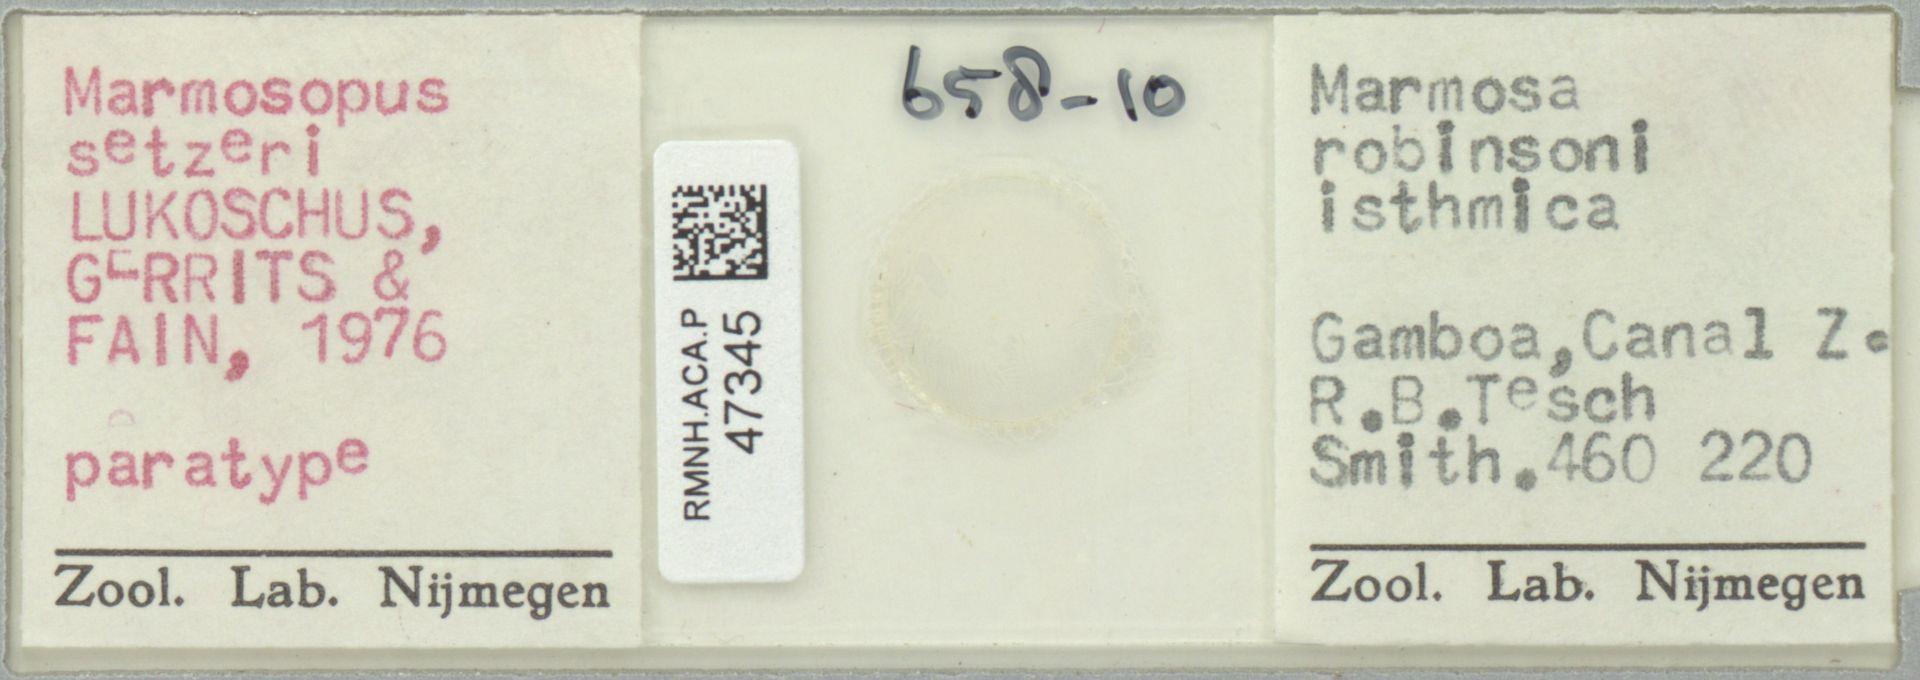 RMNH.ACA.P.47345 | Marmosopus setzeri Lukoschus, Gerrits & Fain, 1976